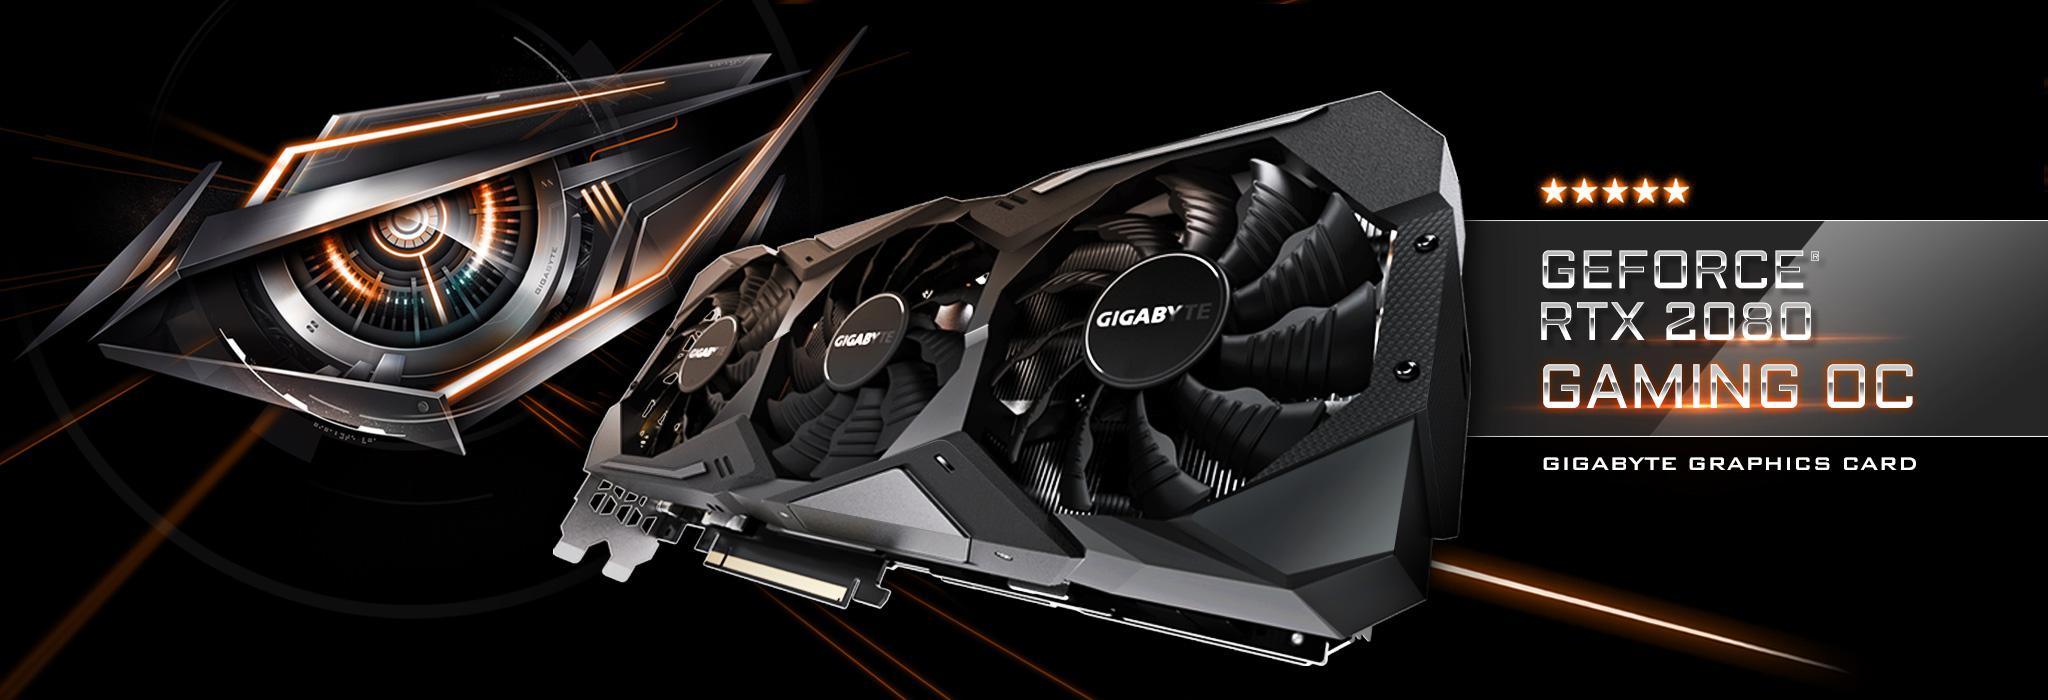 Geforce Rtx 2080 Gaming Oc 8g Graphics Card Gigabyte Global